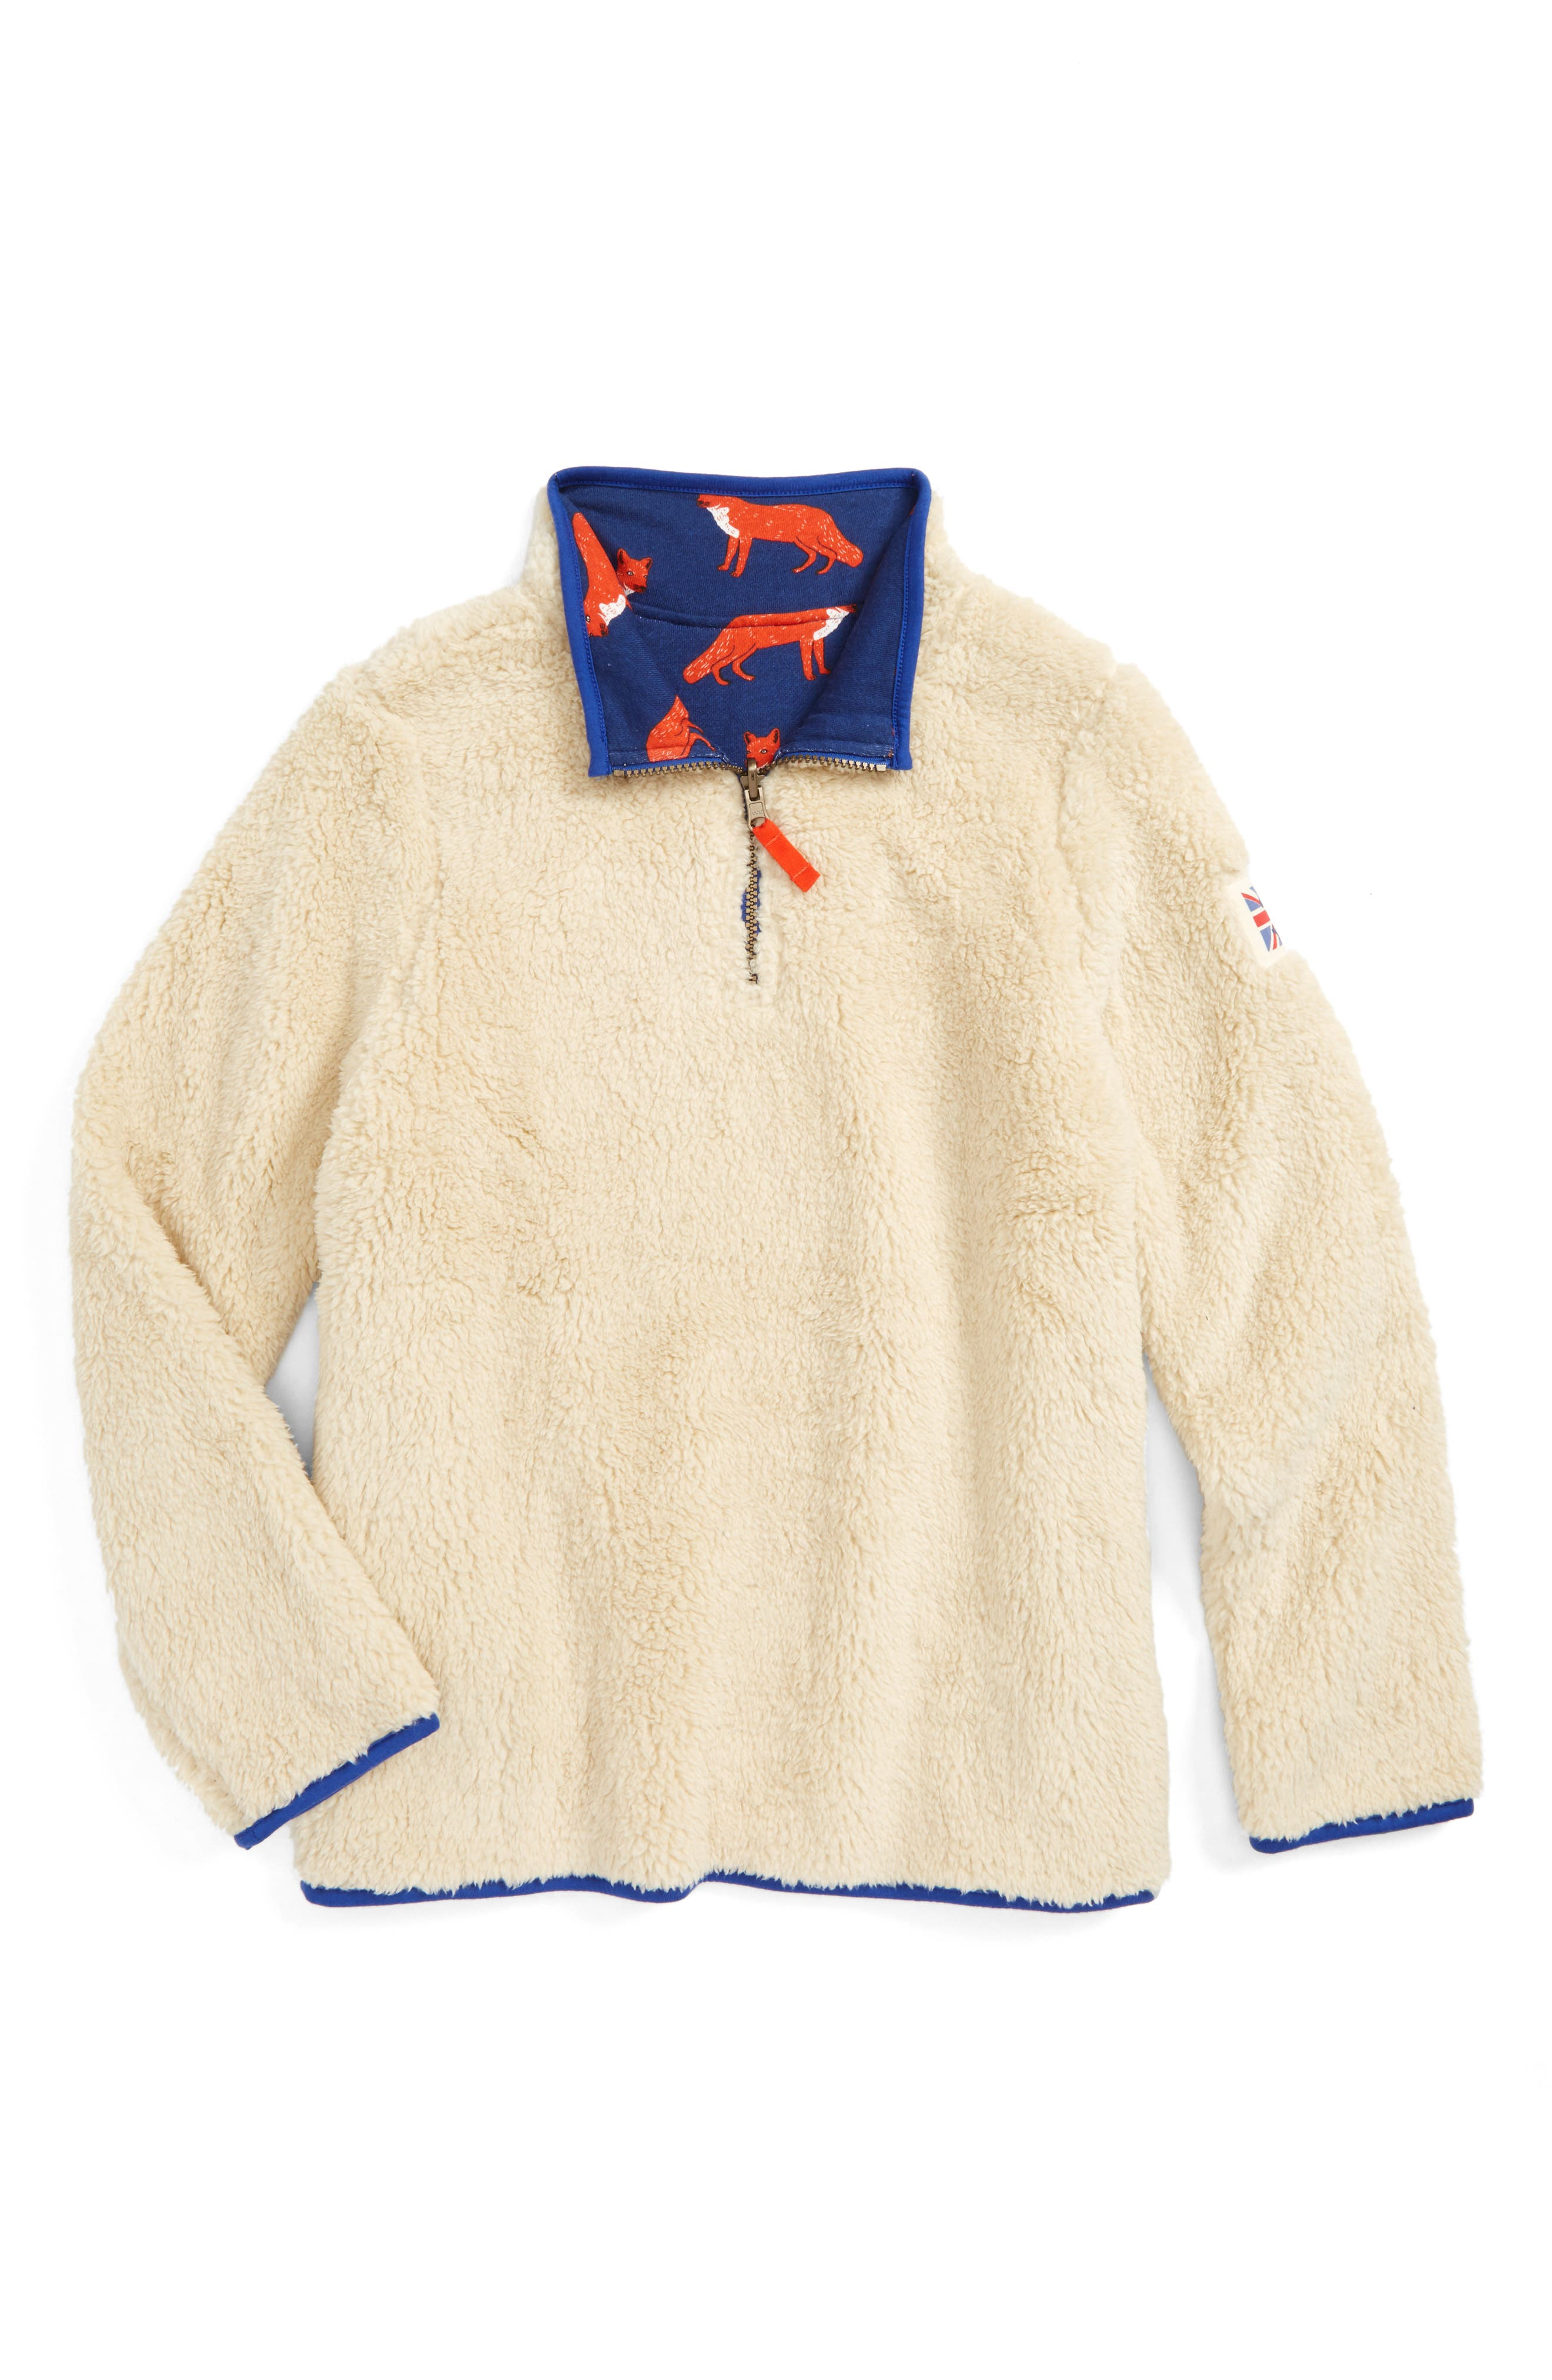 Main Image - Mini Boden Reversible Quarter Zip Sweatshirt (Toddler Boys, Little Boys & Big Boys)